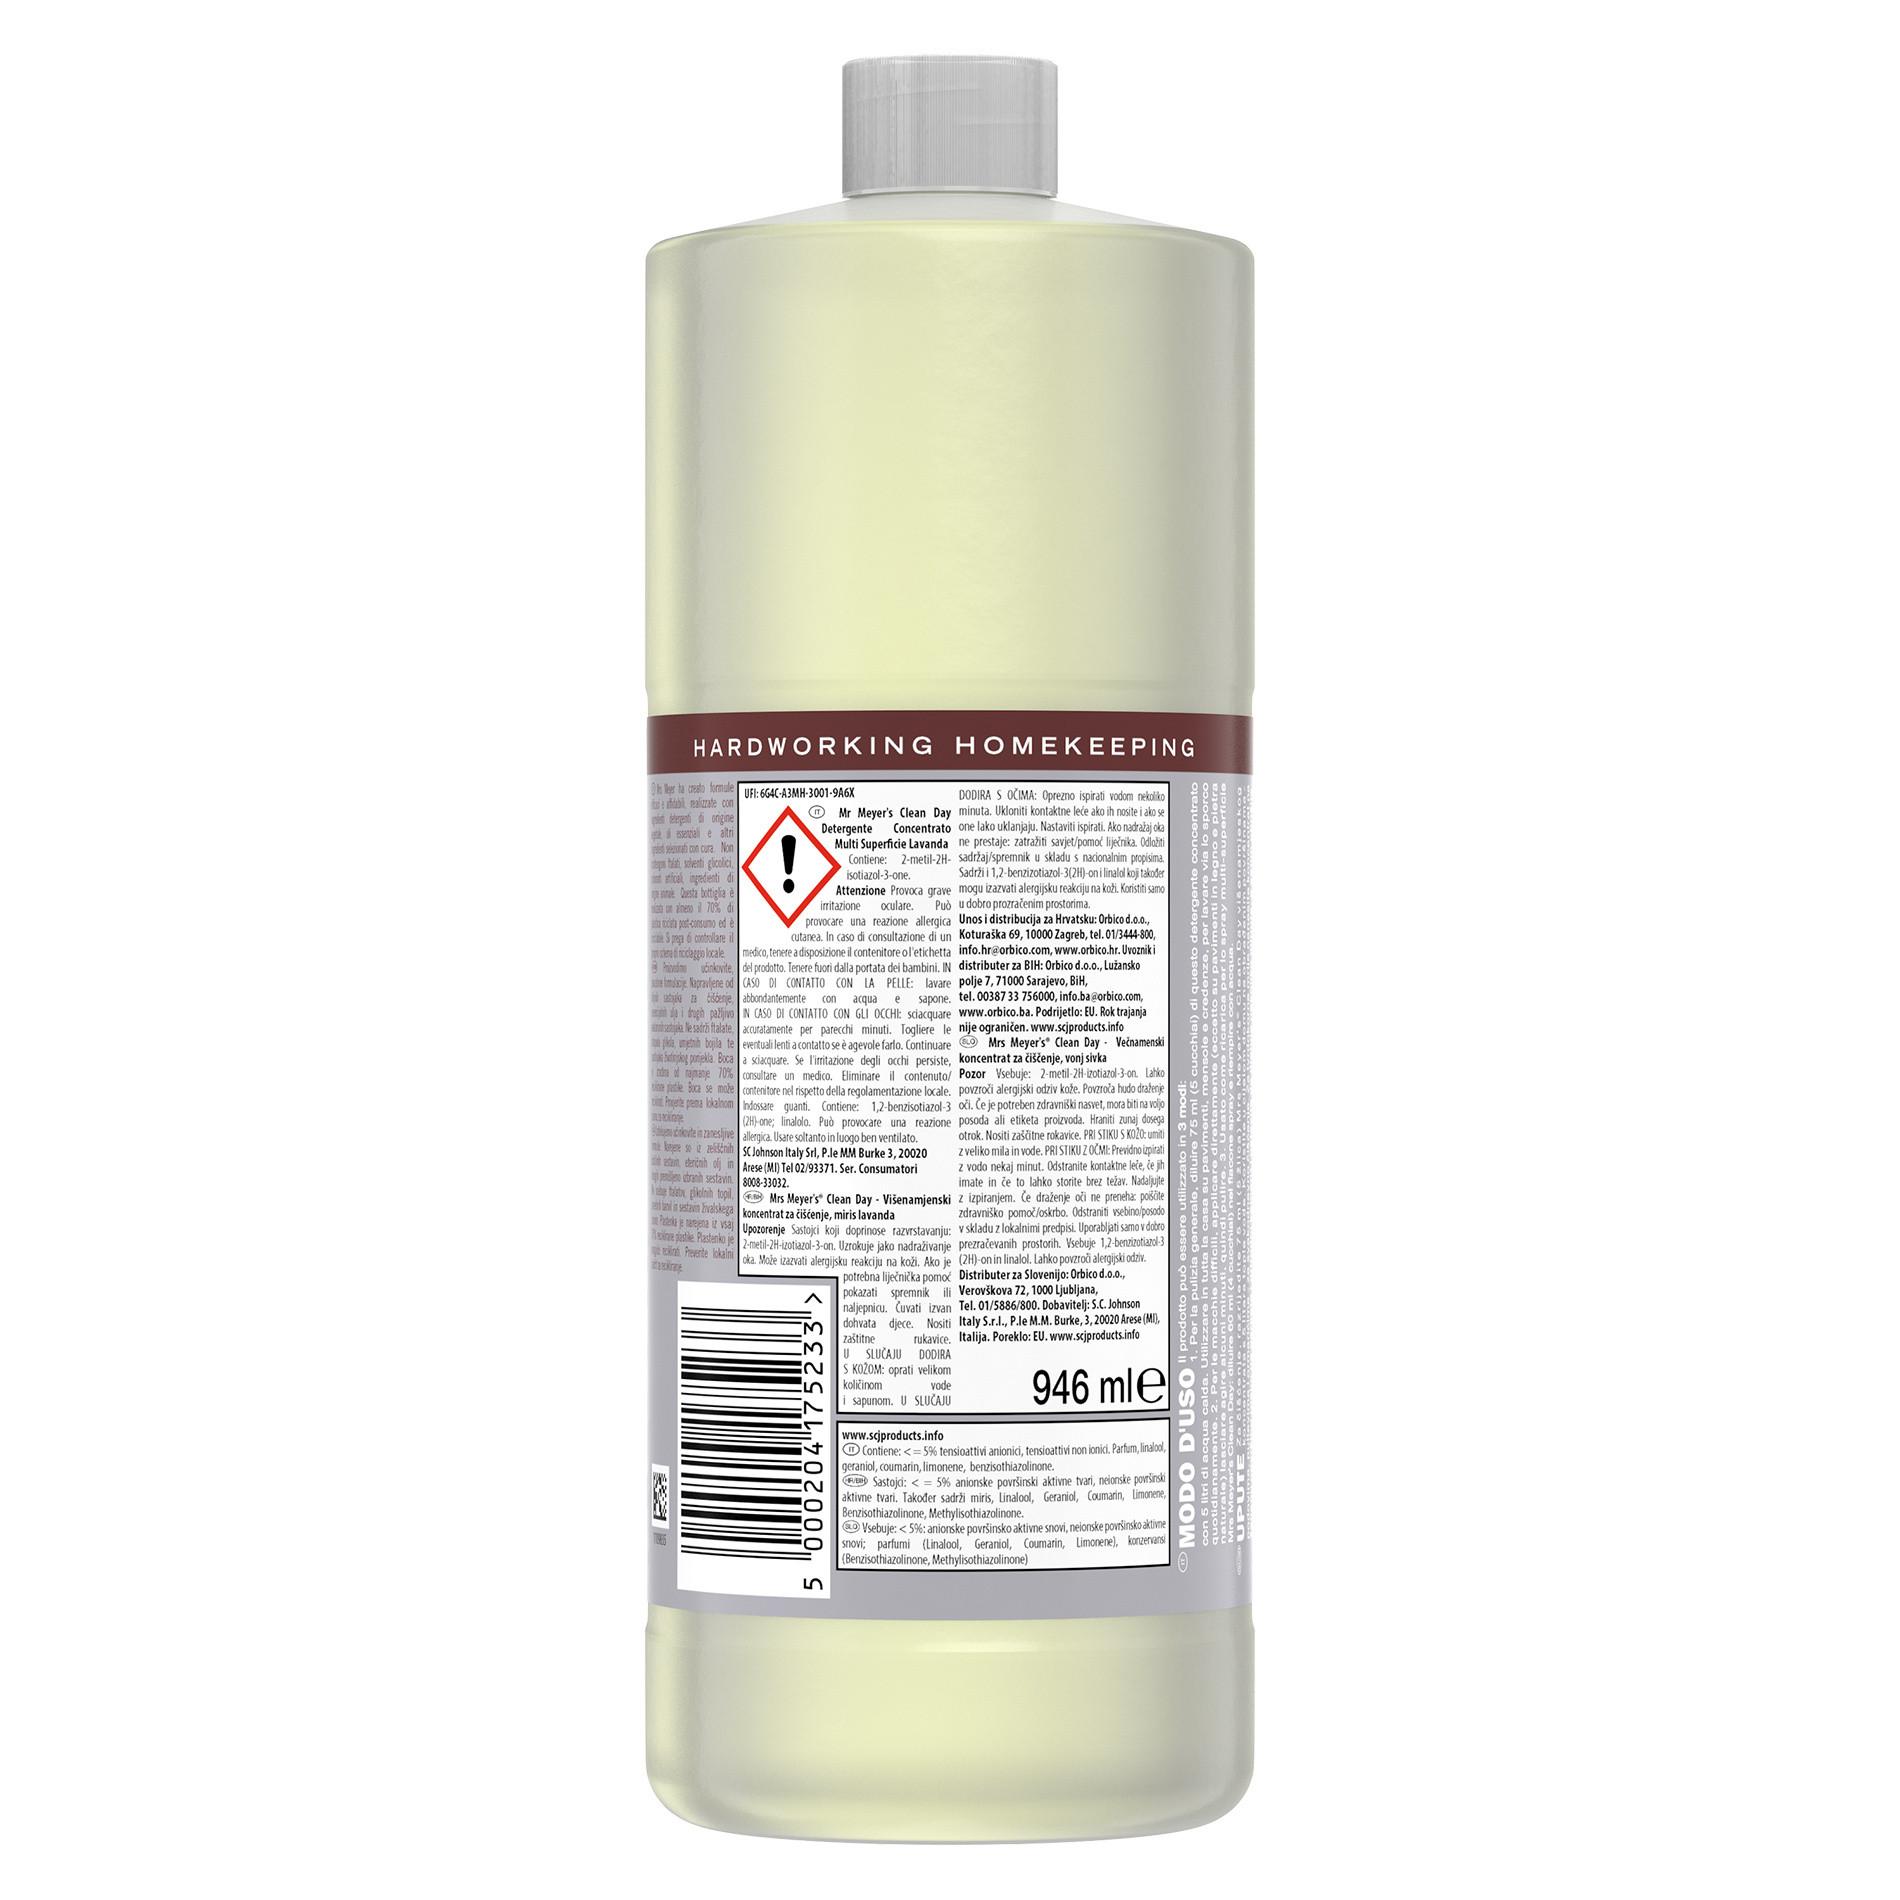 Detergente concentrato multi-supericie profumo di lavanda 946ml, Grigio, large image number 1